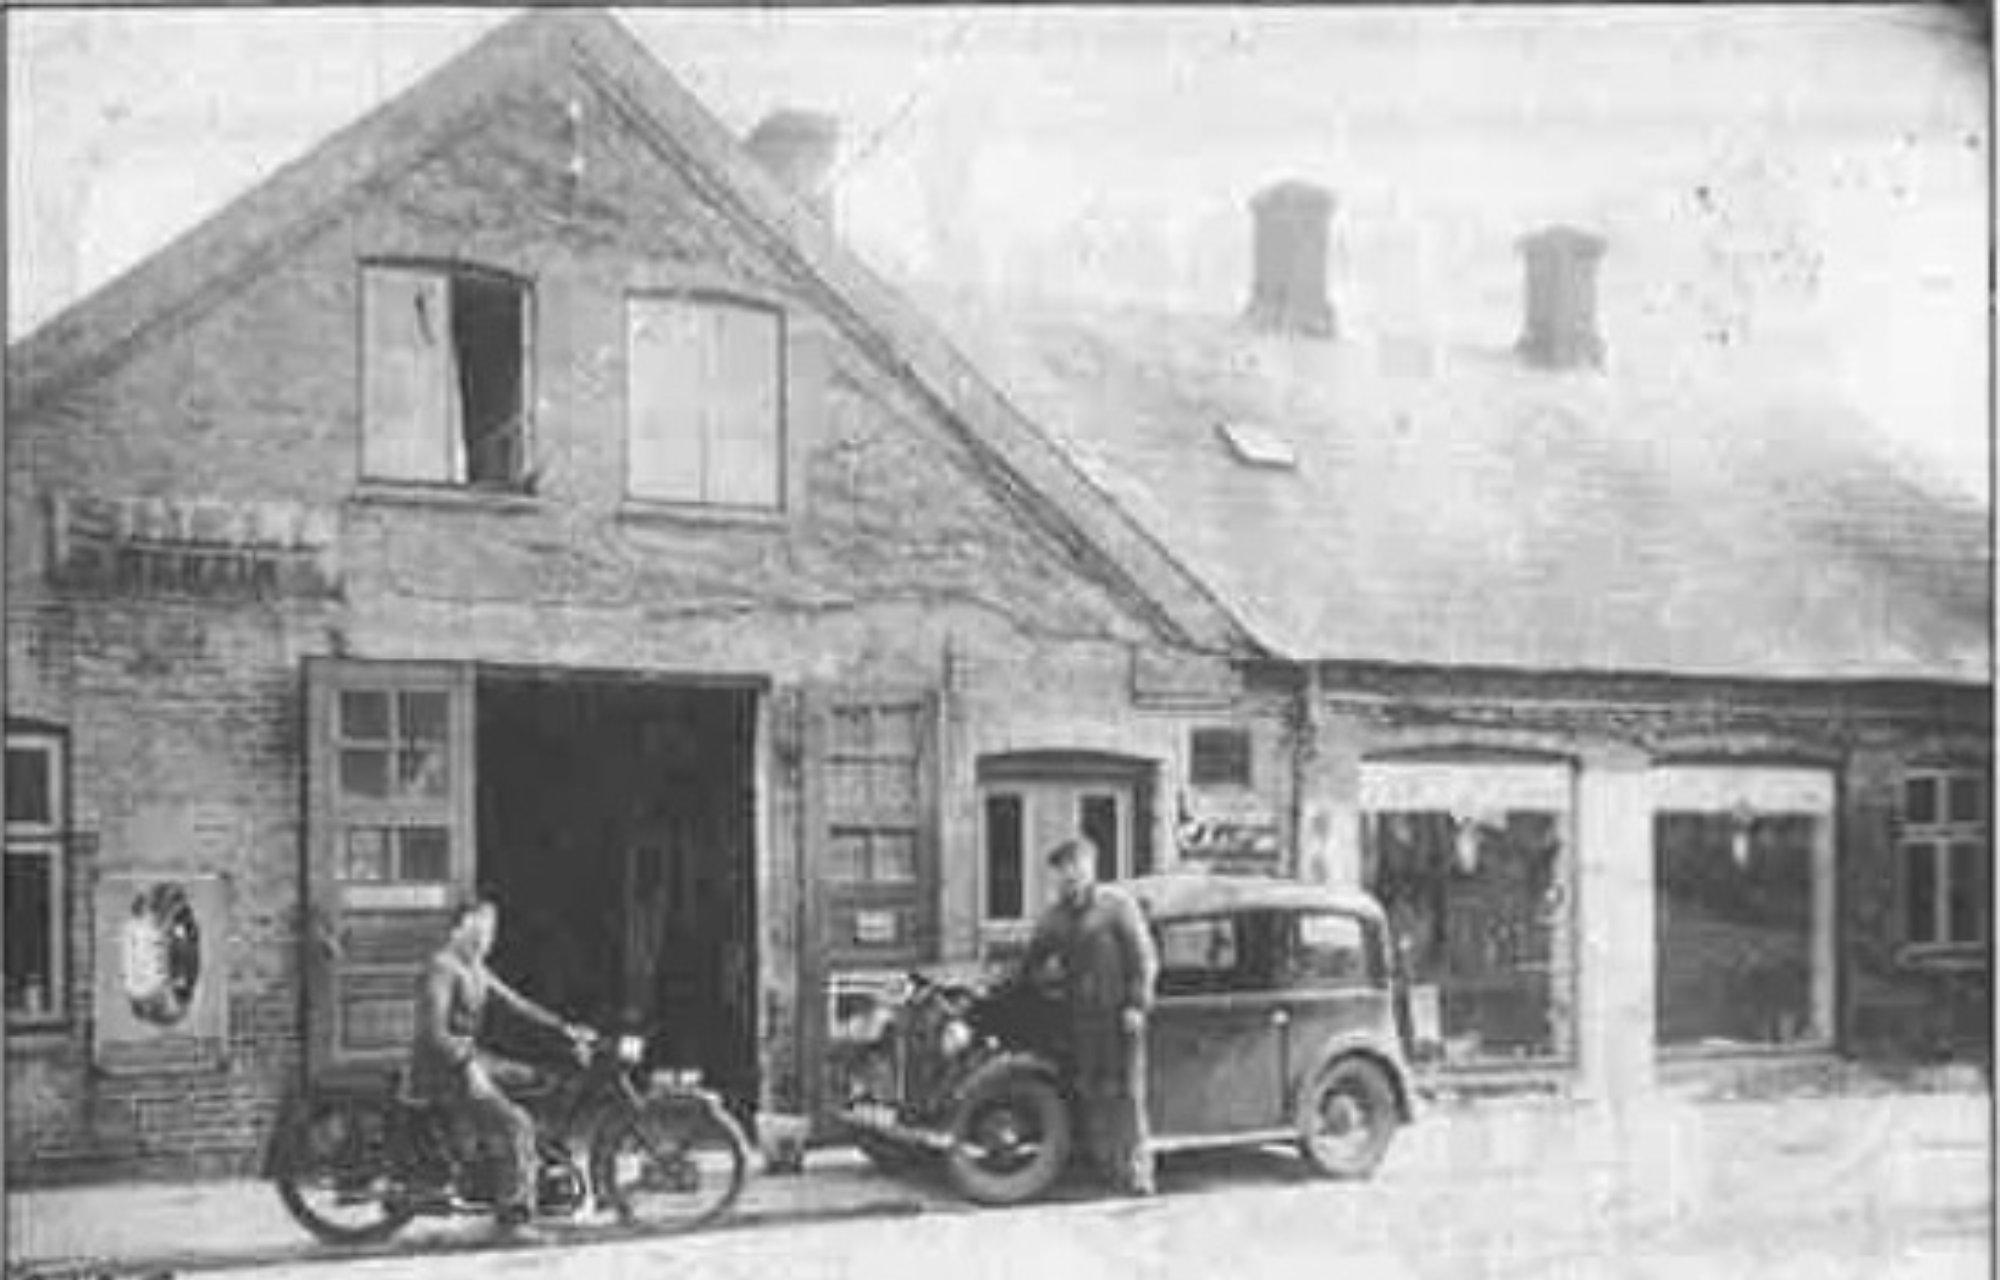 Lægsgaard i Bred, Bredgade 37. Ved bilen Poul Lægsgaard. Ca. år 1946